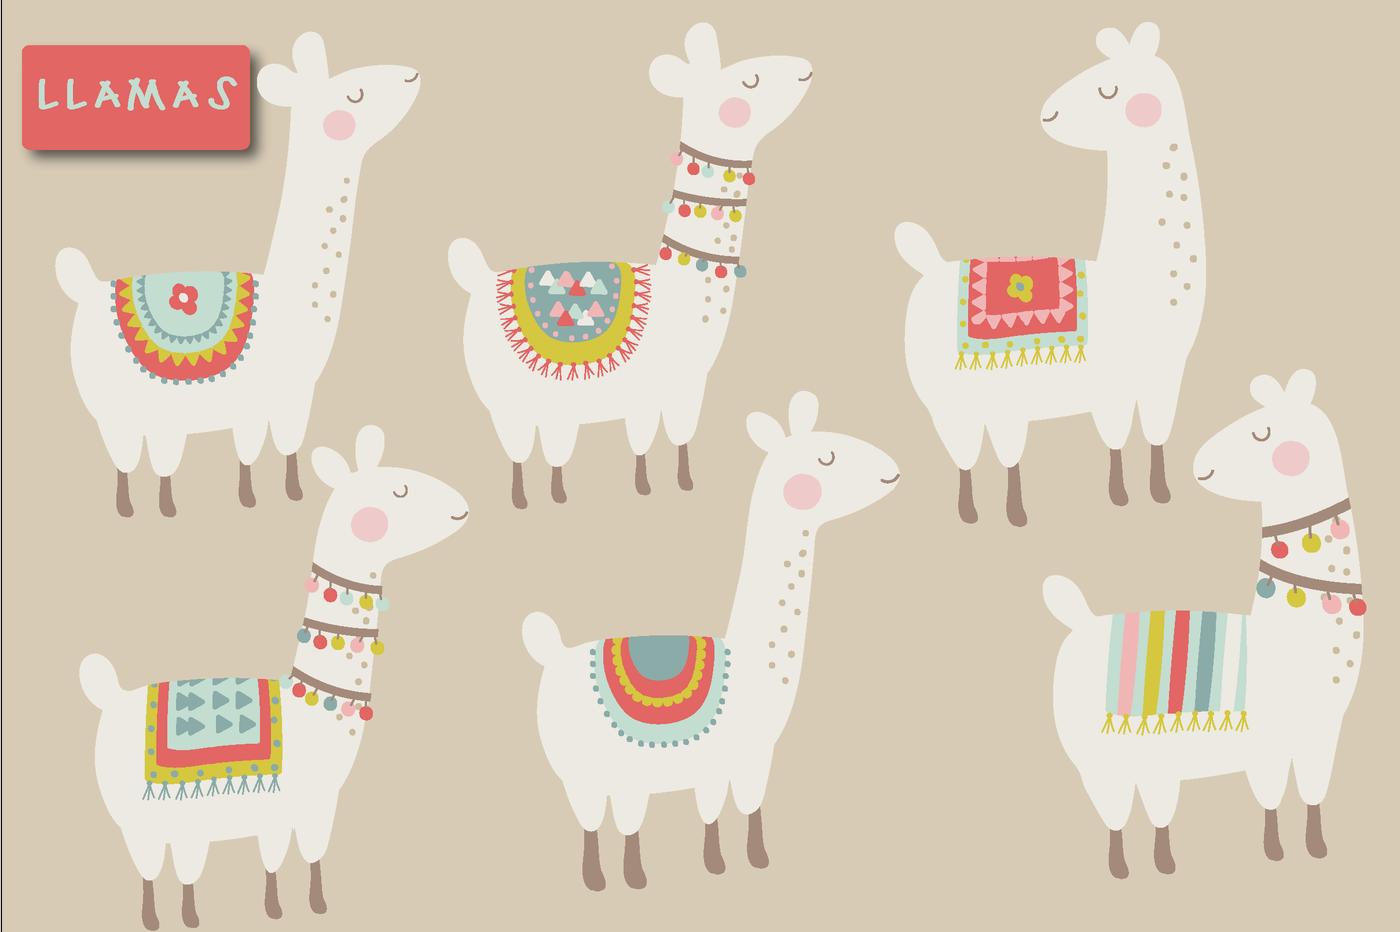 Llama clipart. Cute by poppymoon design